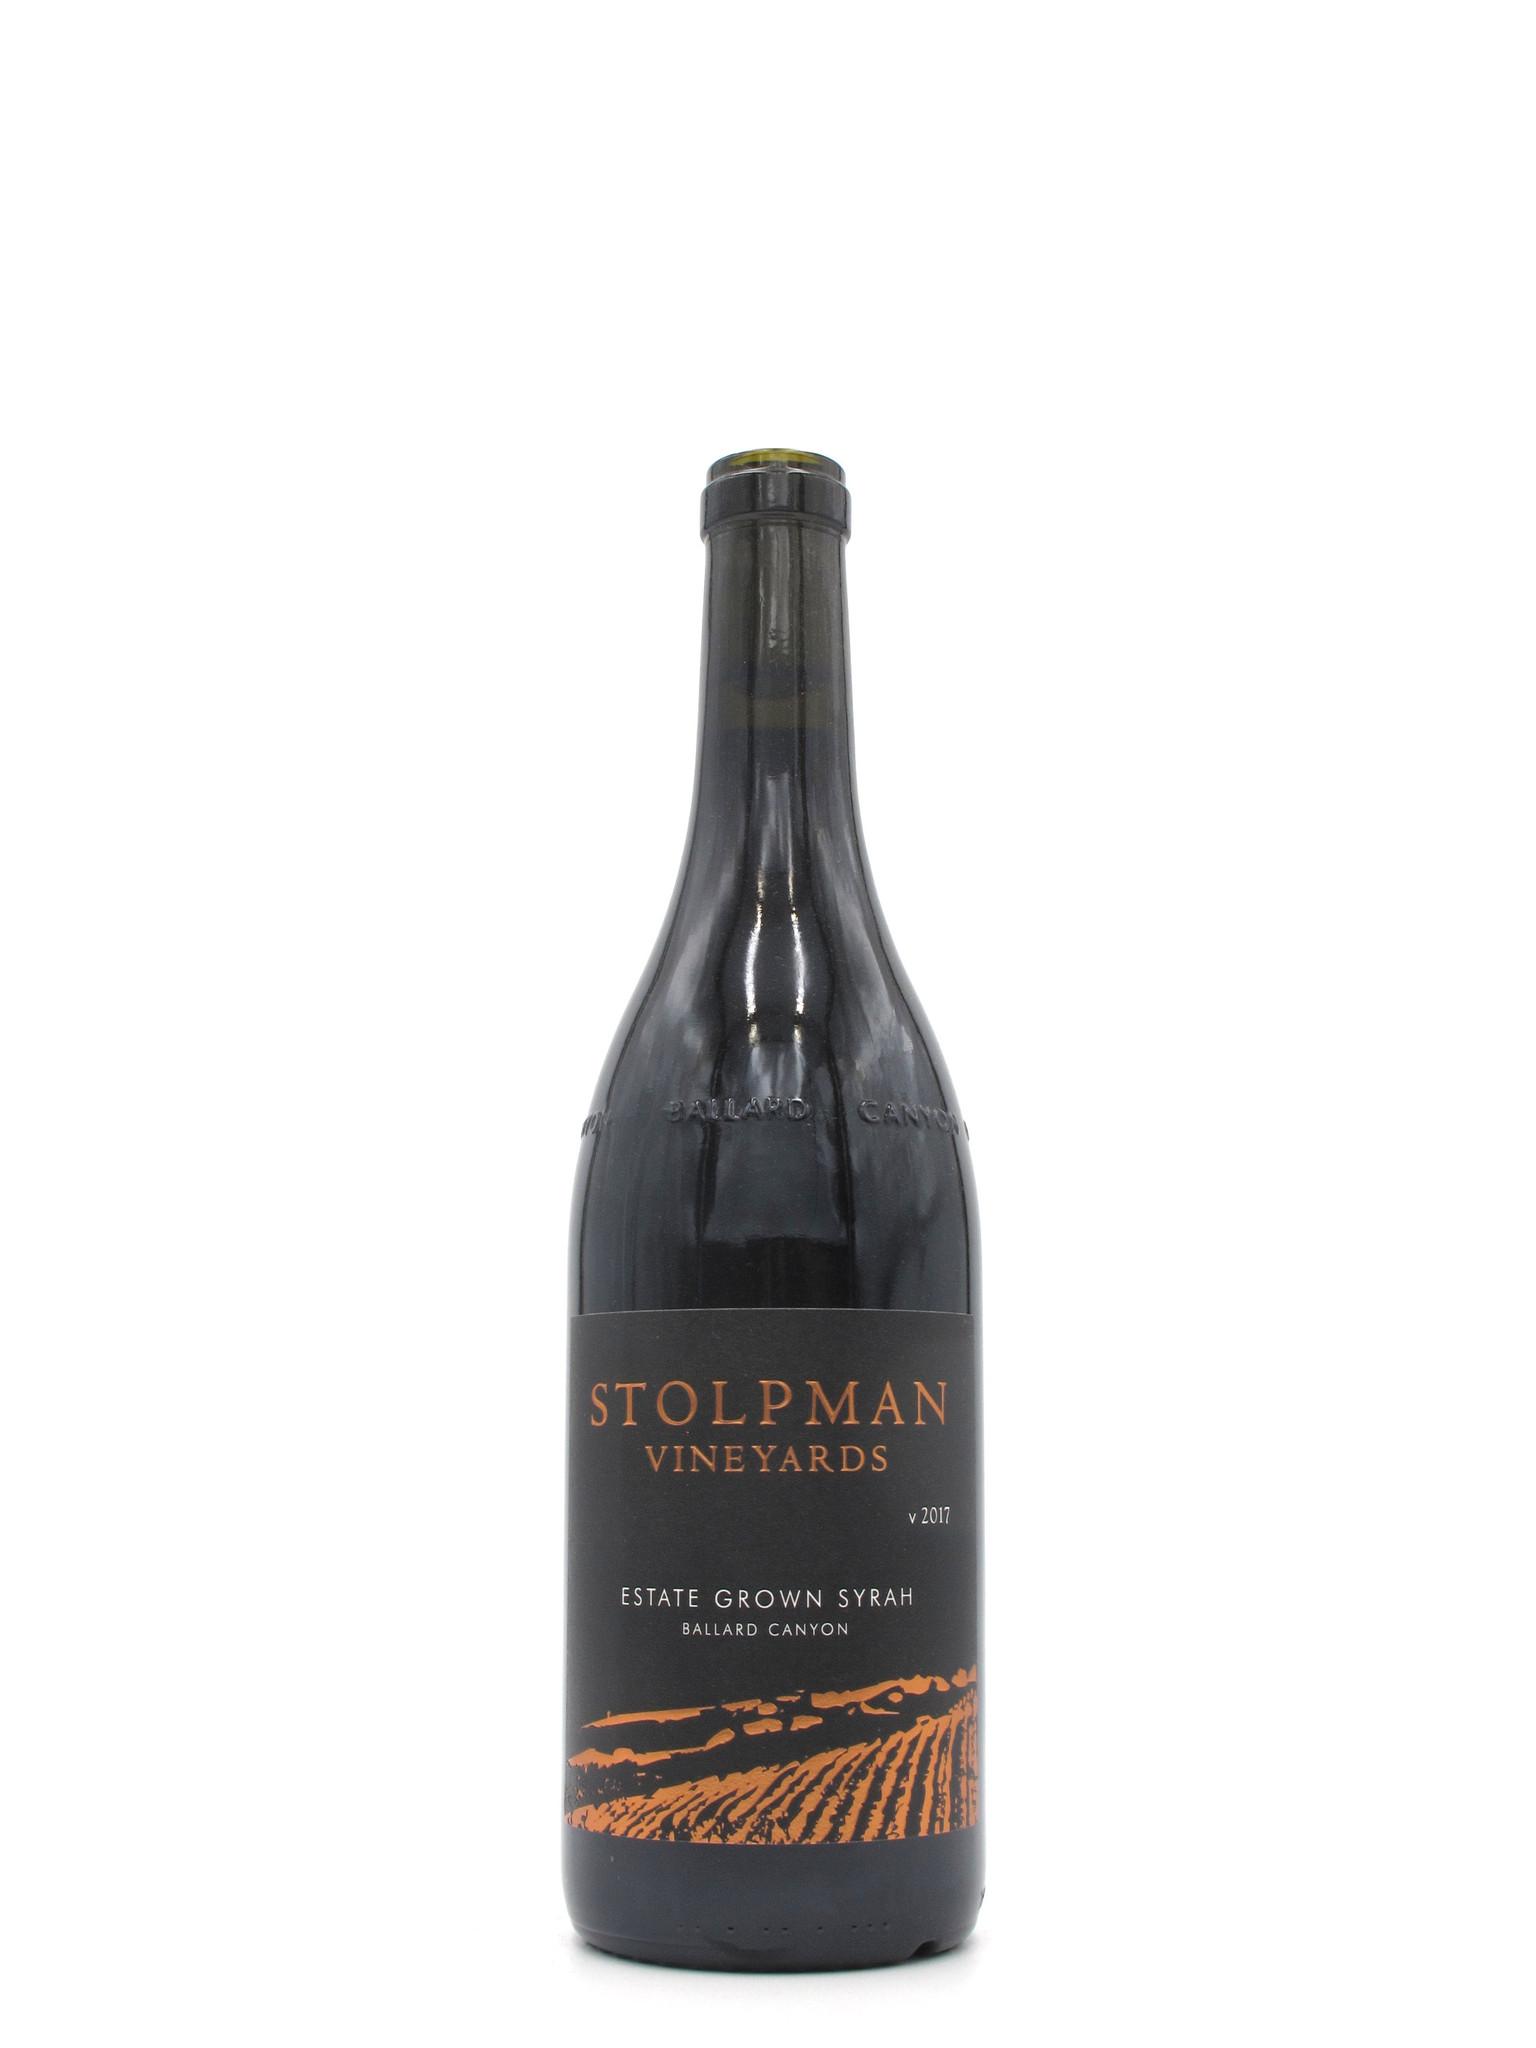 Stolpman Vineyards 2017 Stolpman Vineyards Santa Ynez Valley Syrah Estate Grown 750mL